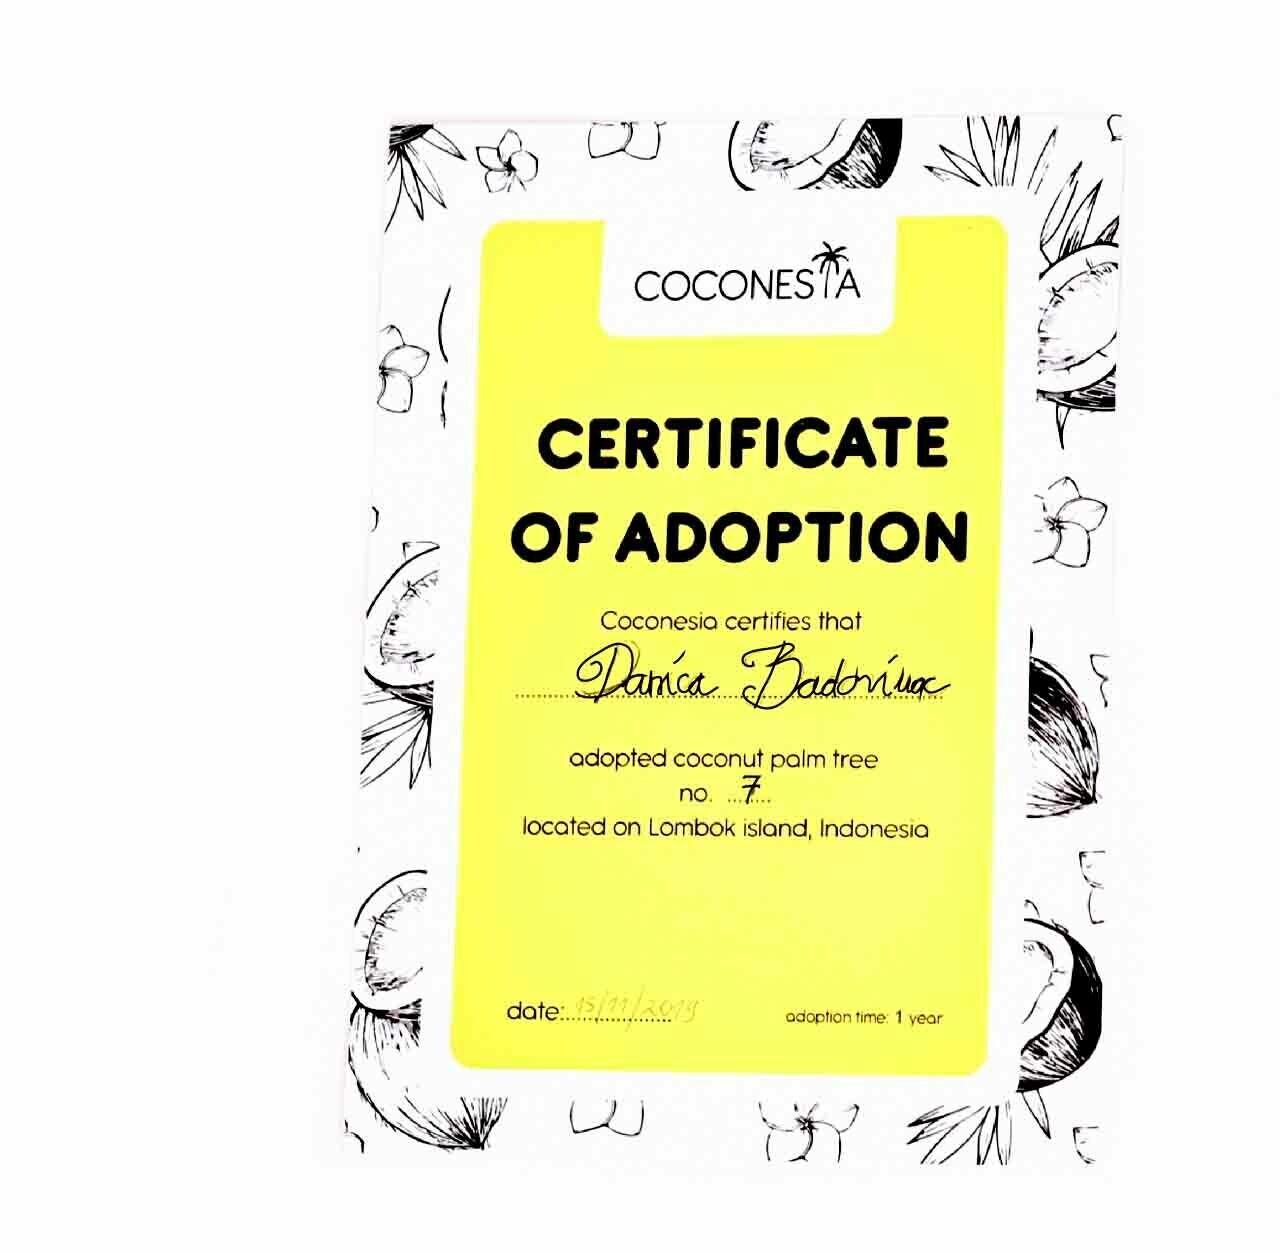 Adoption packet no. 1